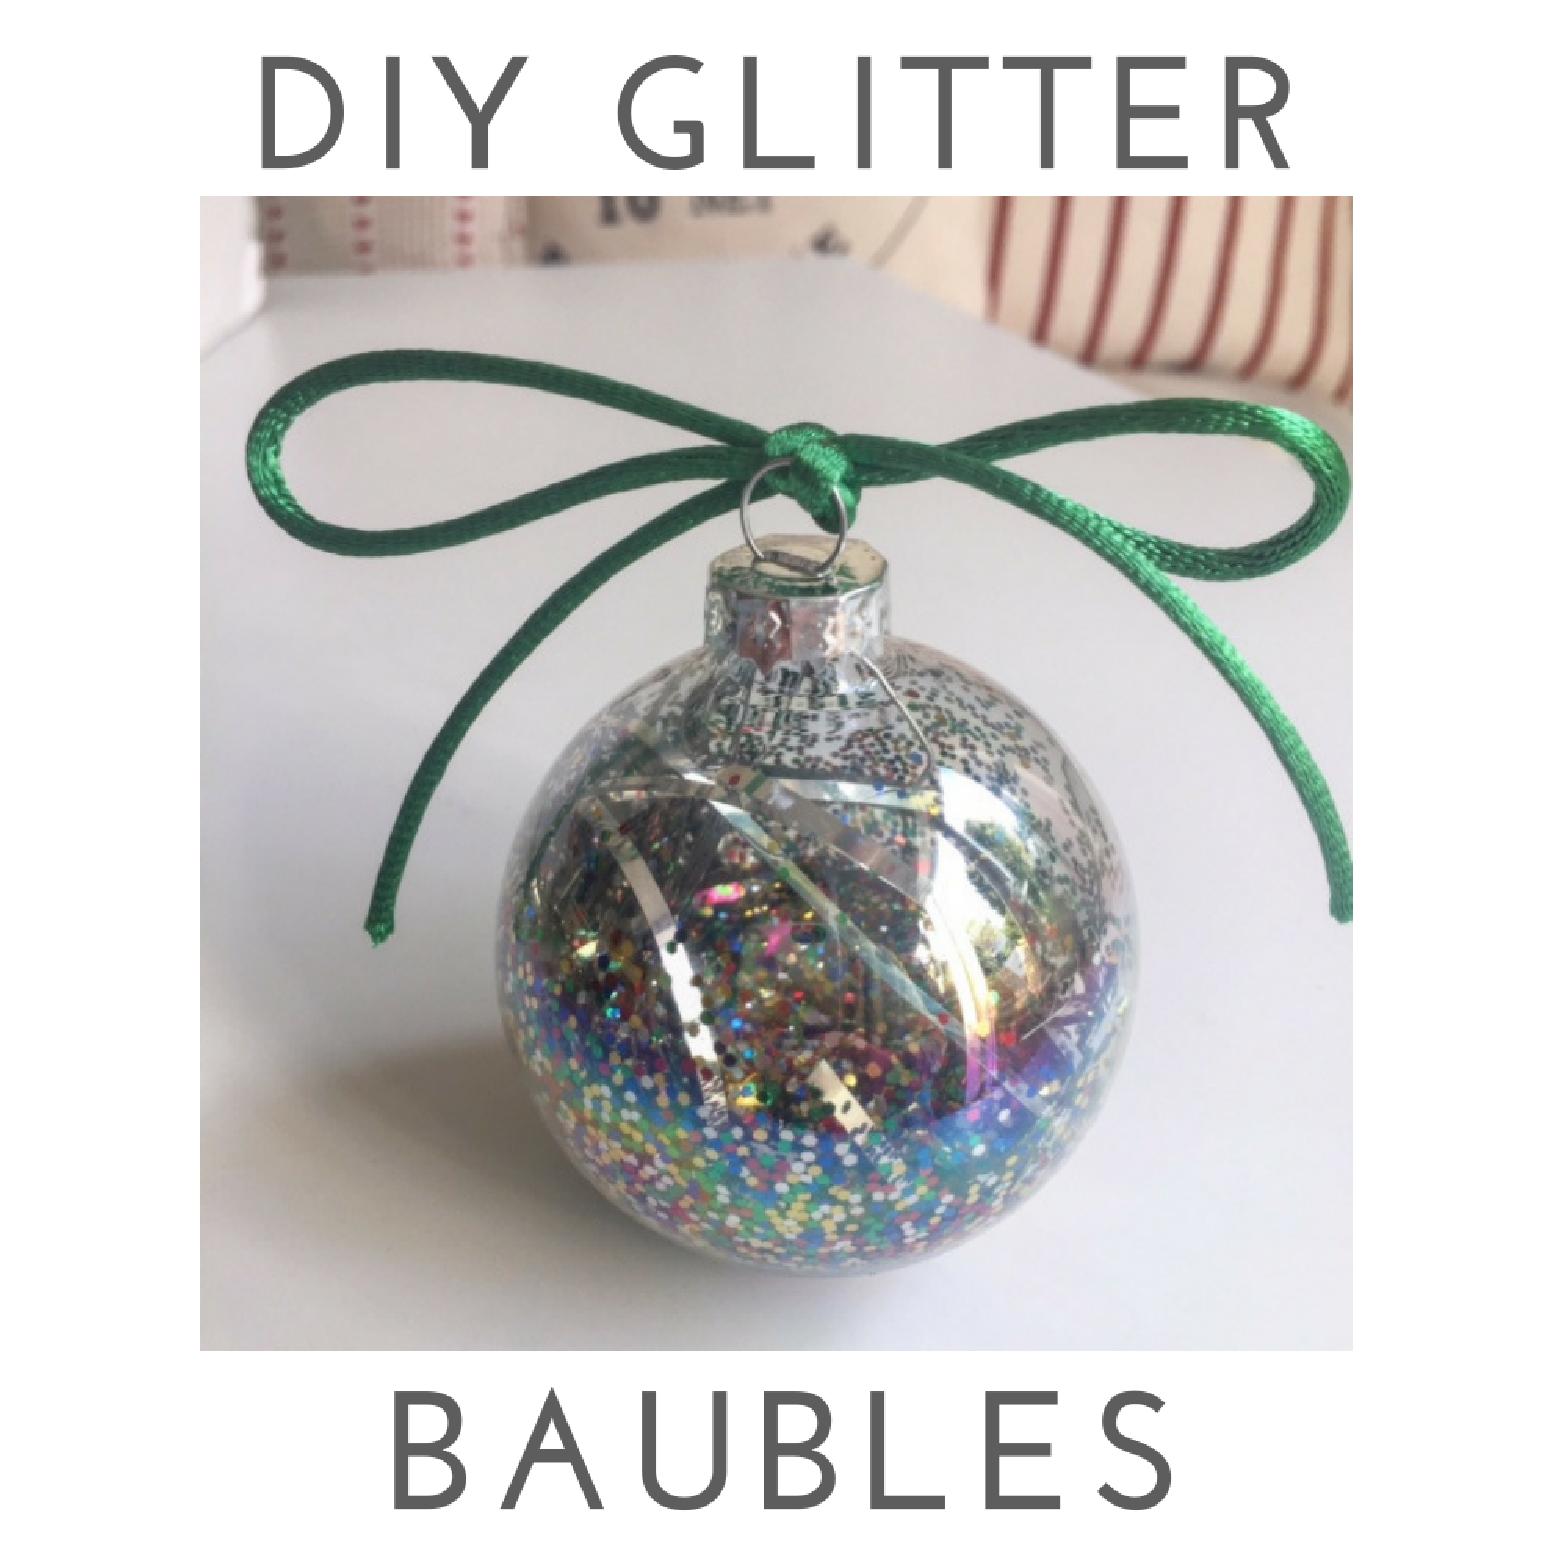 DIY-glitter-baubles.png